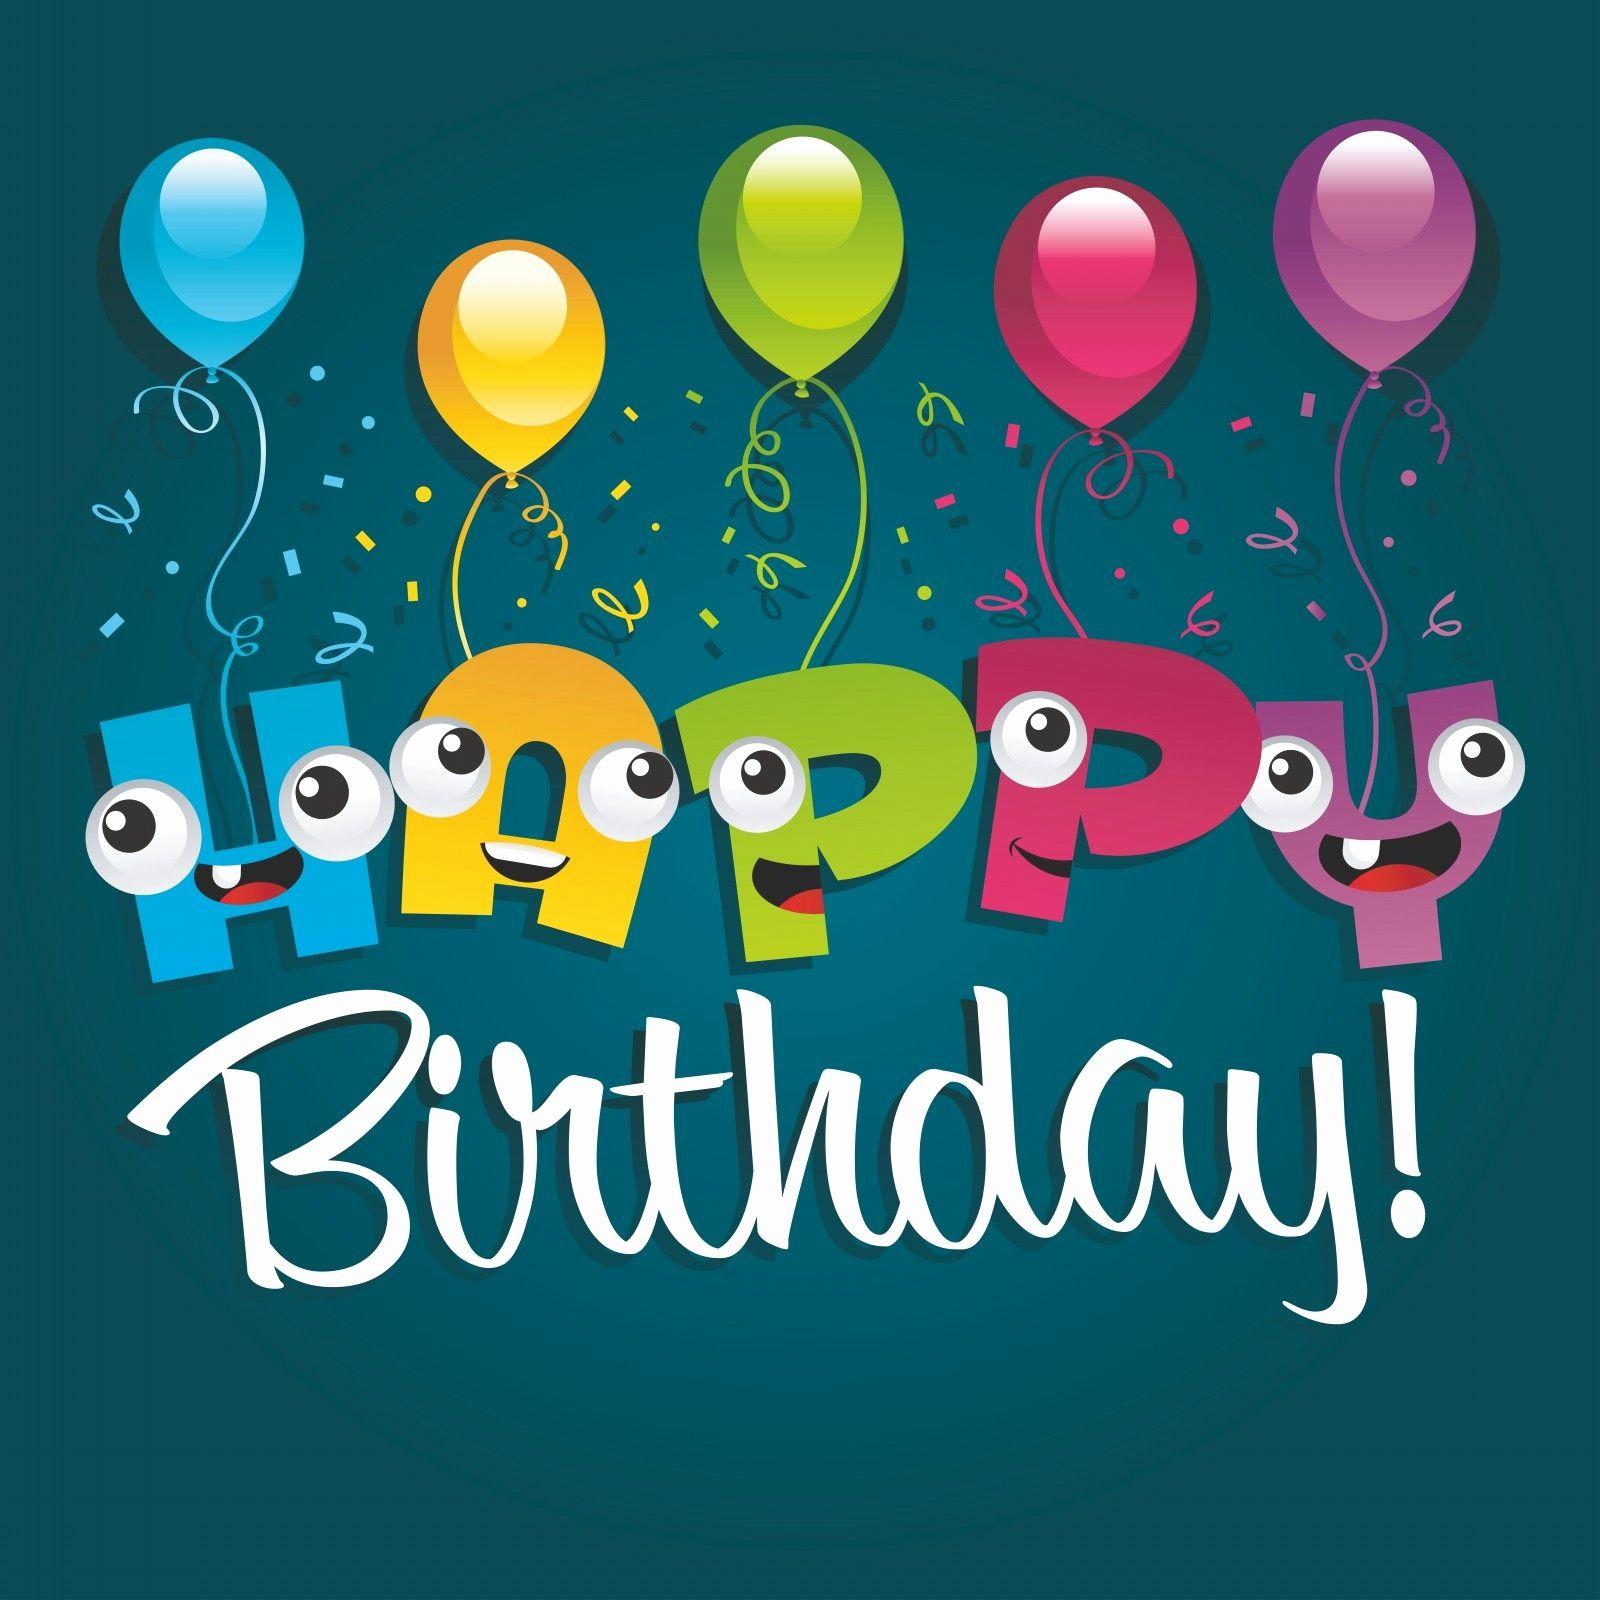 Happy Birthday Wishes For A Man Lovely Happy Birthday